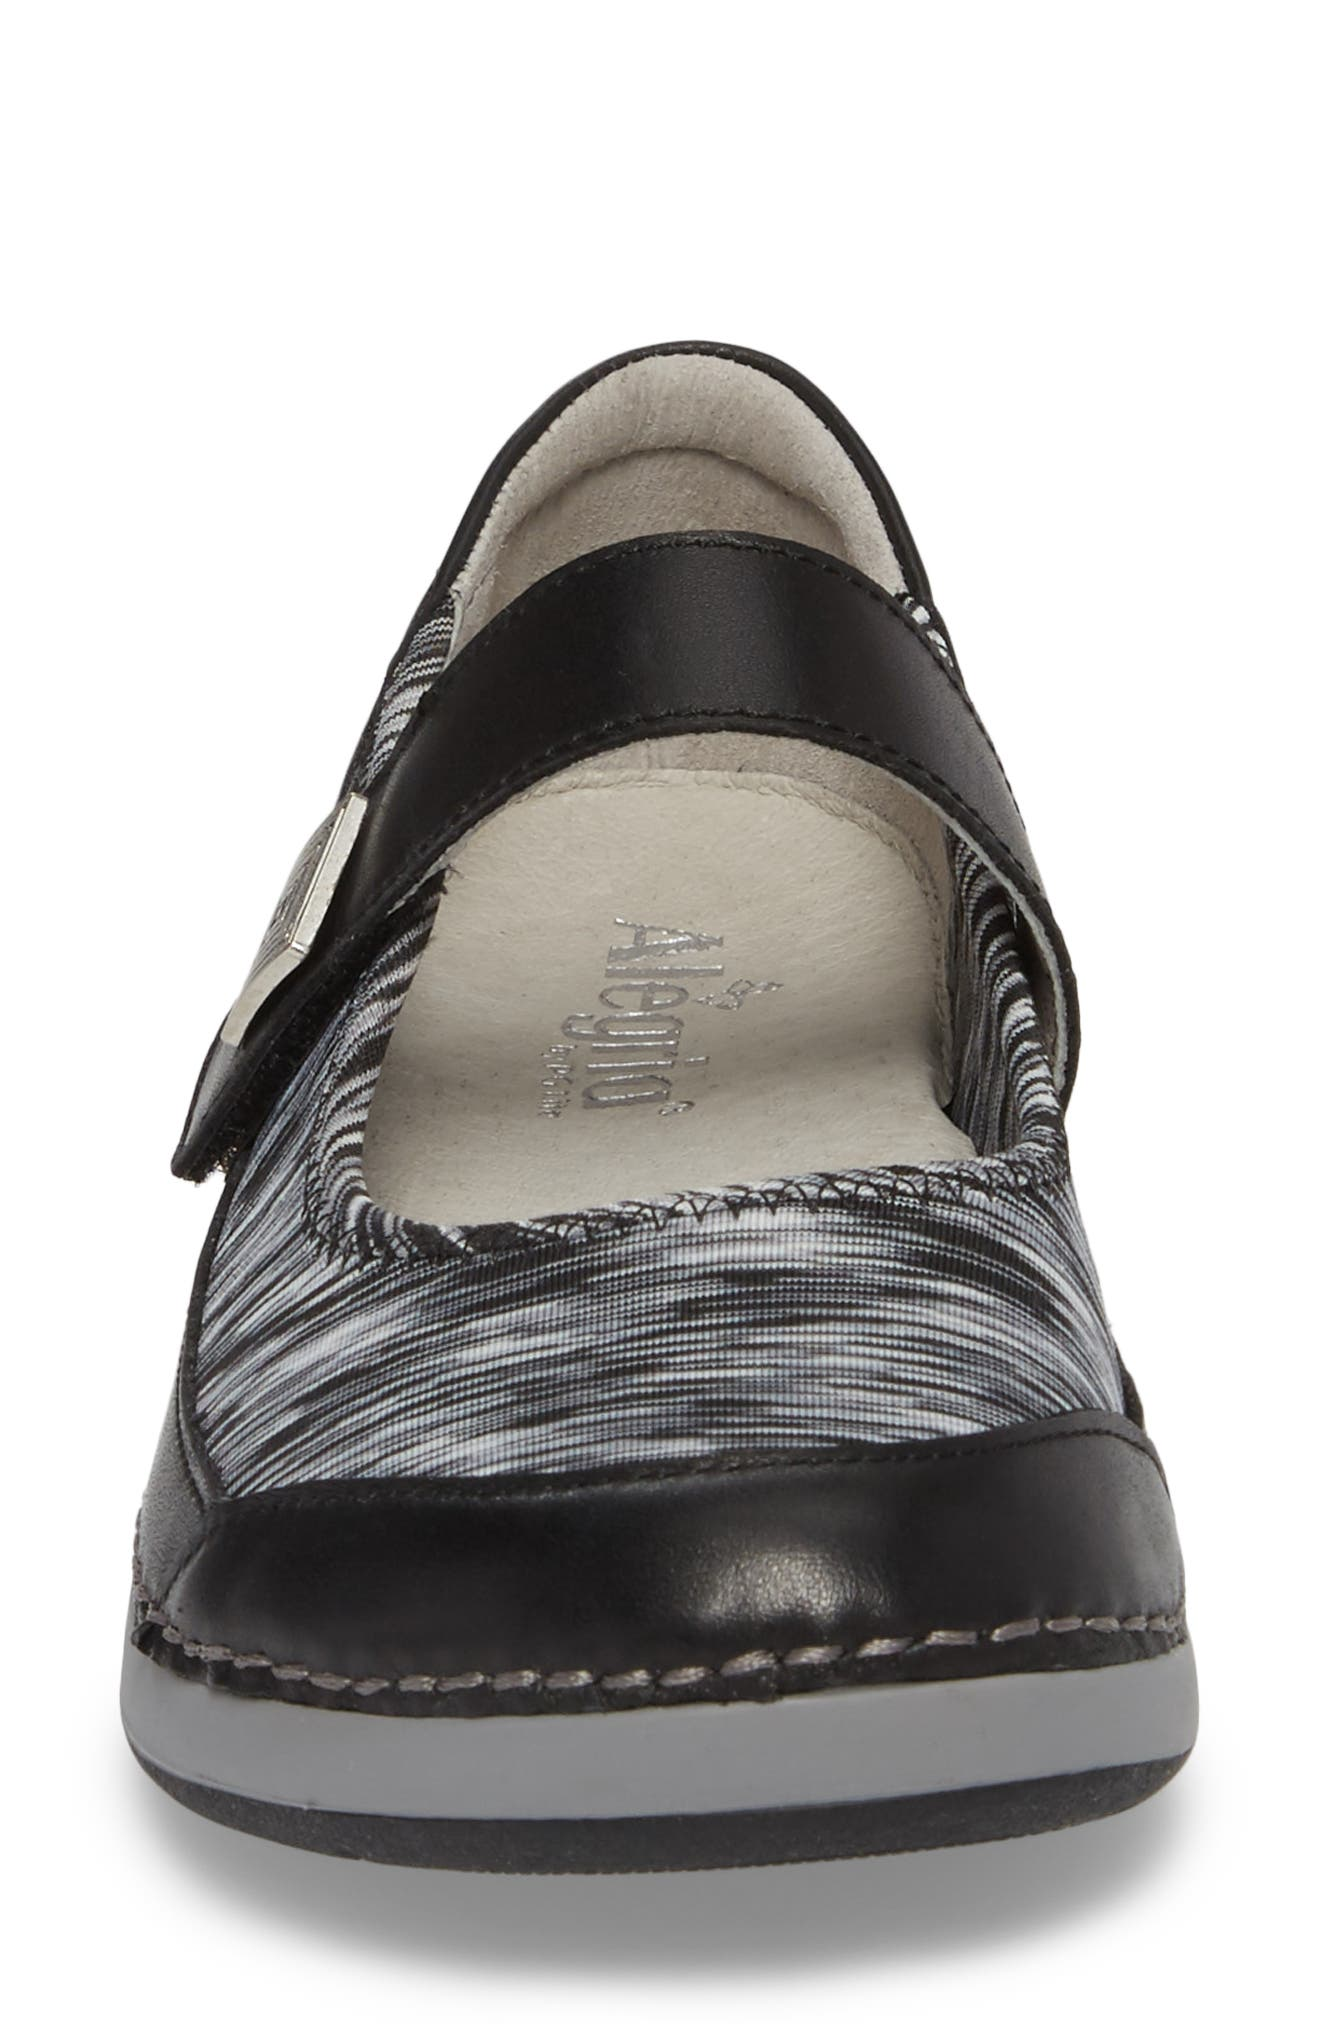 Gem Mary Jane Flat,                             Alternate thumbnail 4, color,                             Black Leather